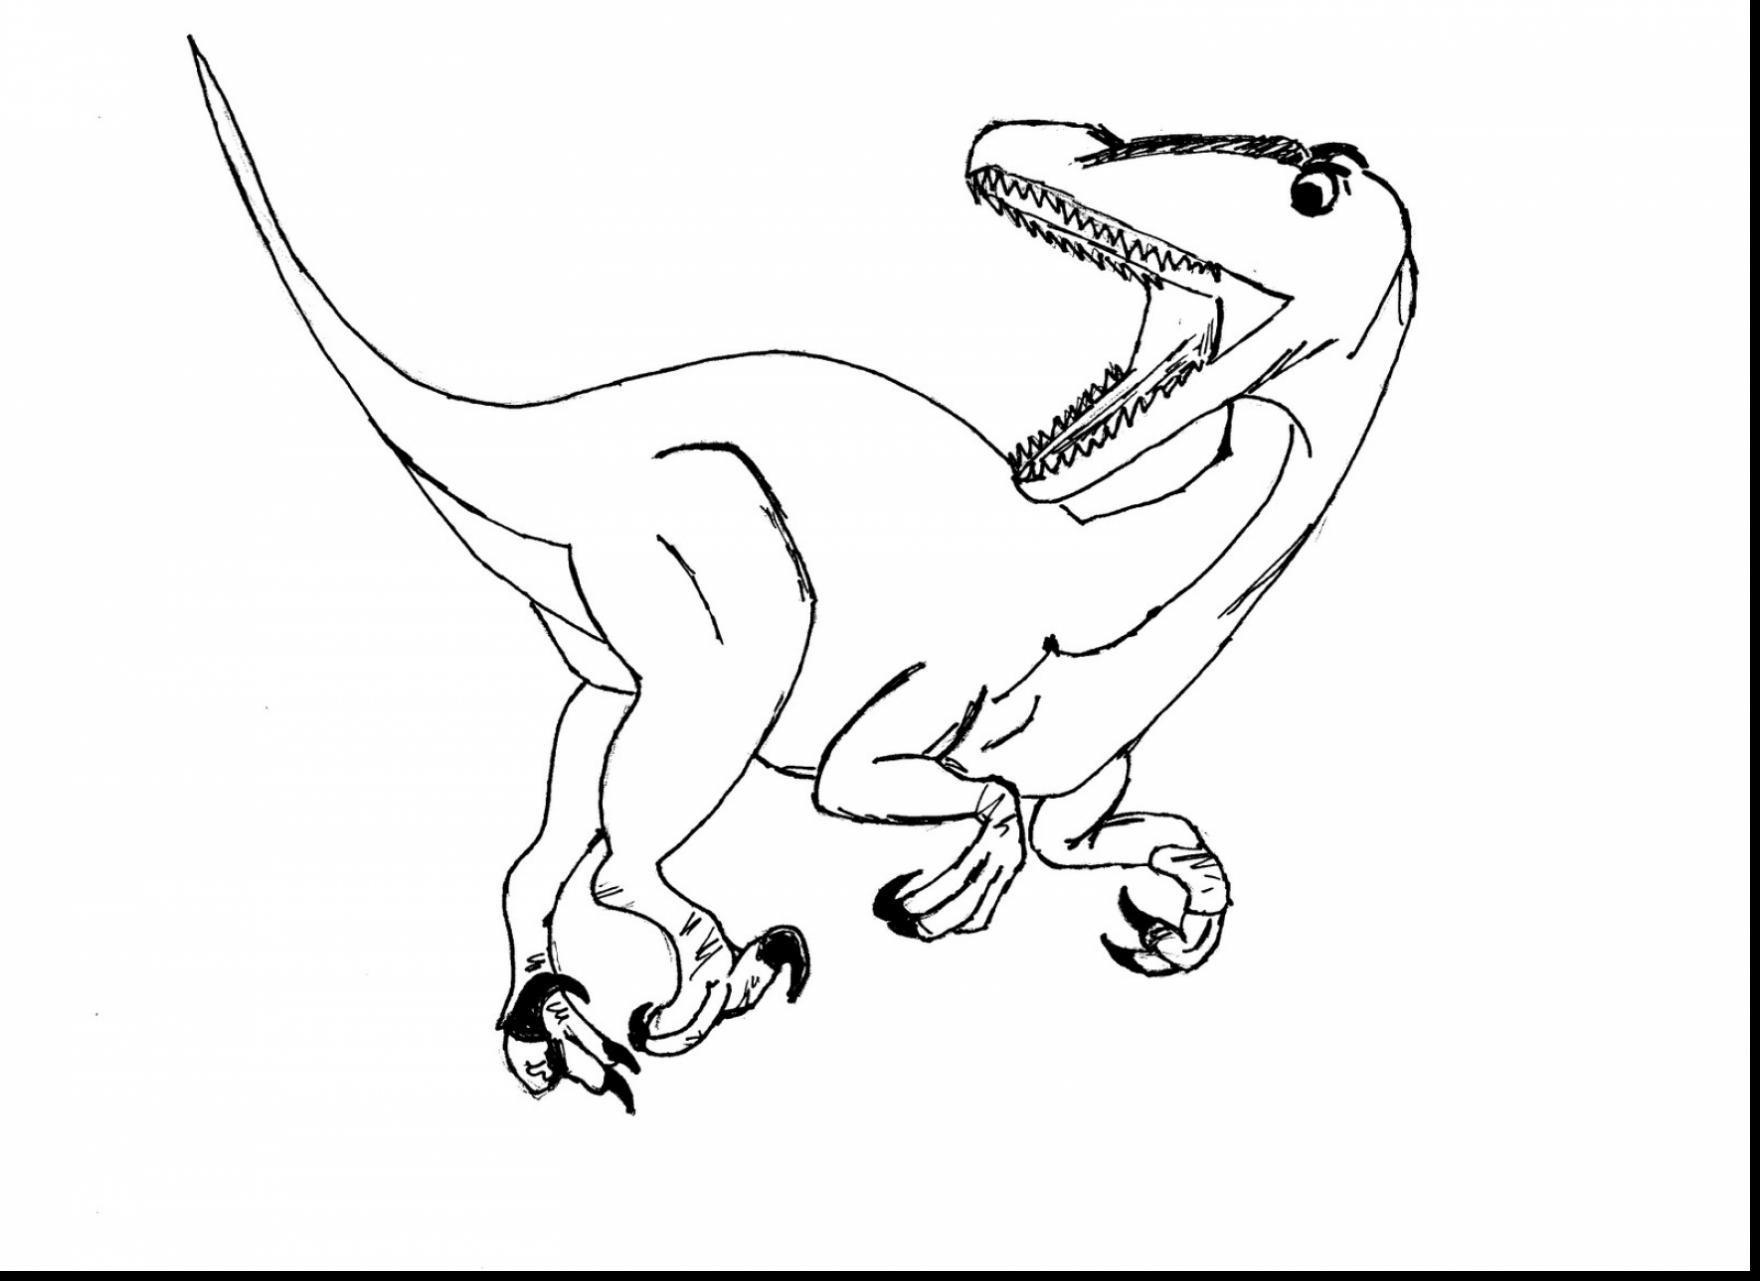 Ausmalbilder Jurassic World Neu Jurassic World Coloring Pages Fotos